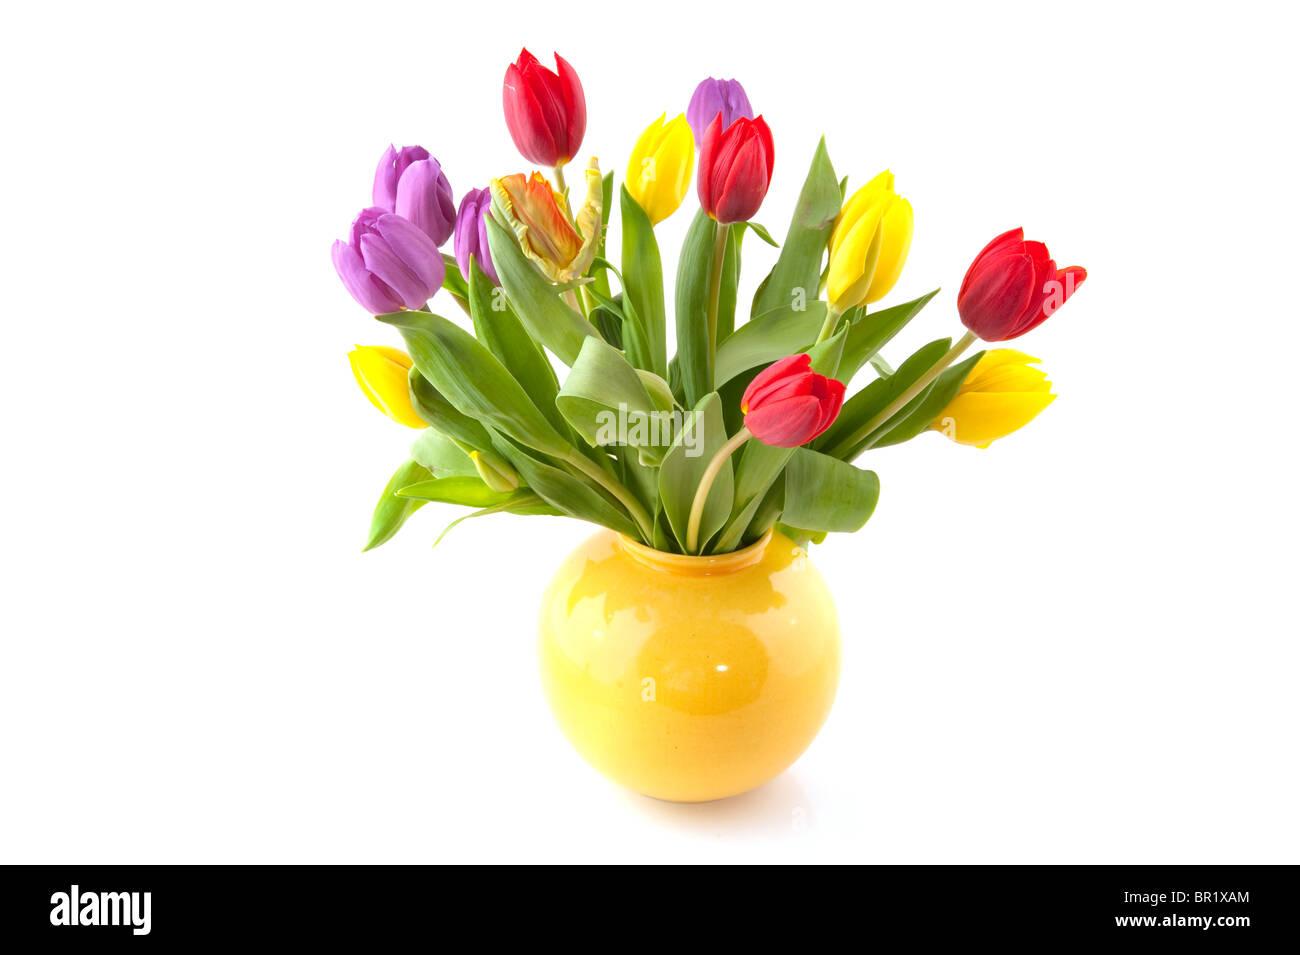 Colorido Ramo de tulipanes en florero amarillo Foto de stock